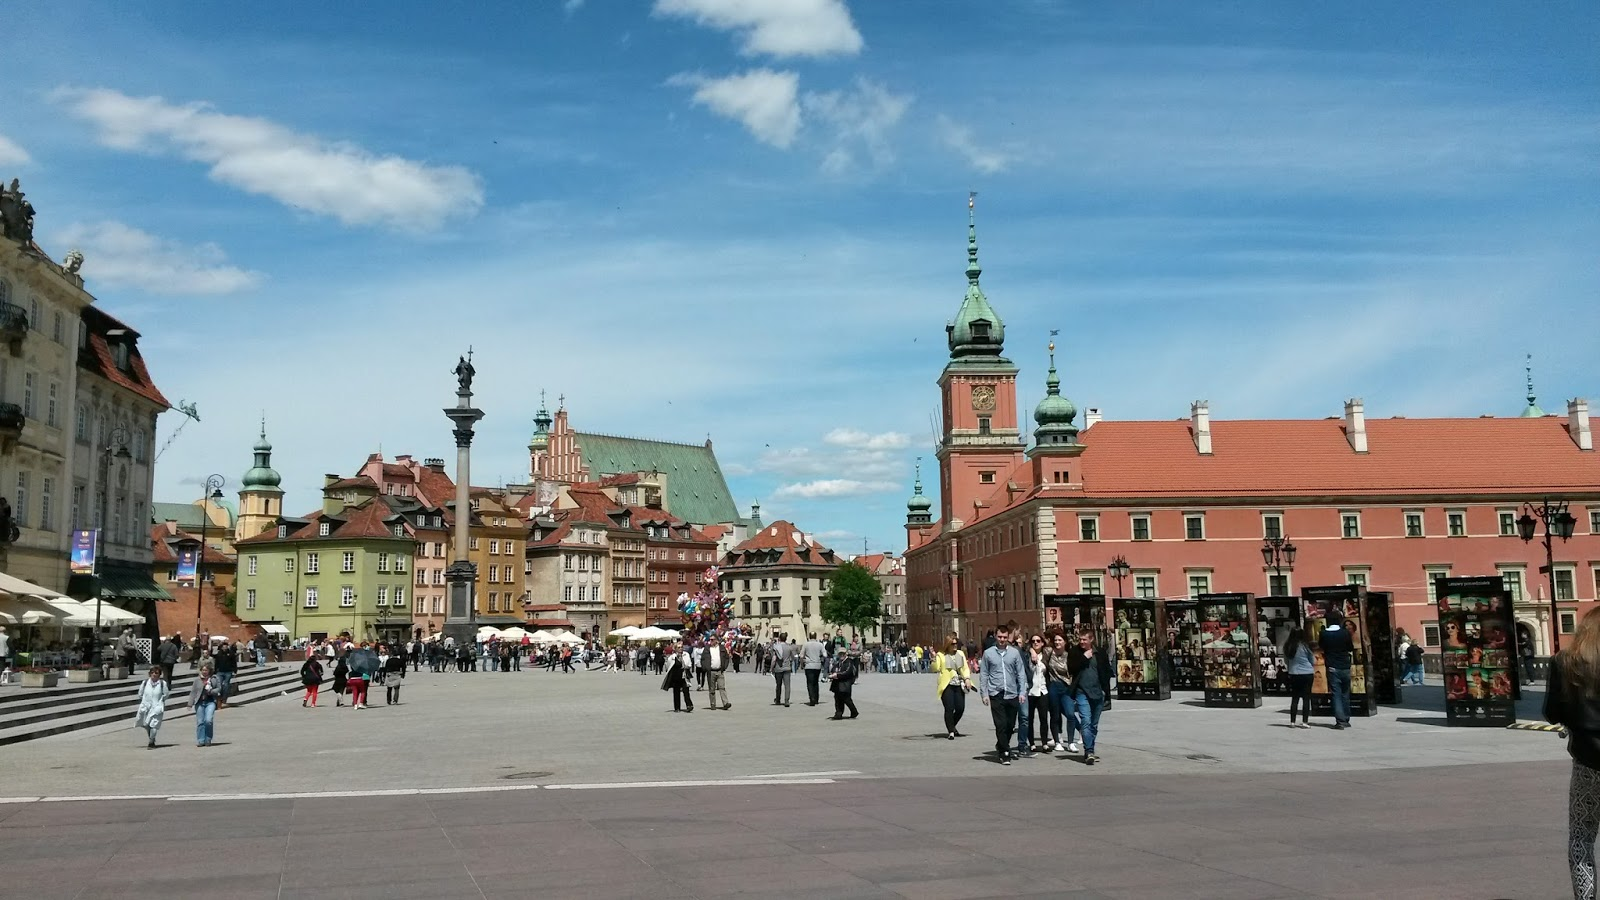 Plac Zamkowy Castle Square Kolumna Zygmunta Sigismunds Column